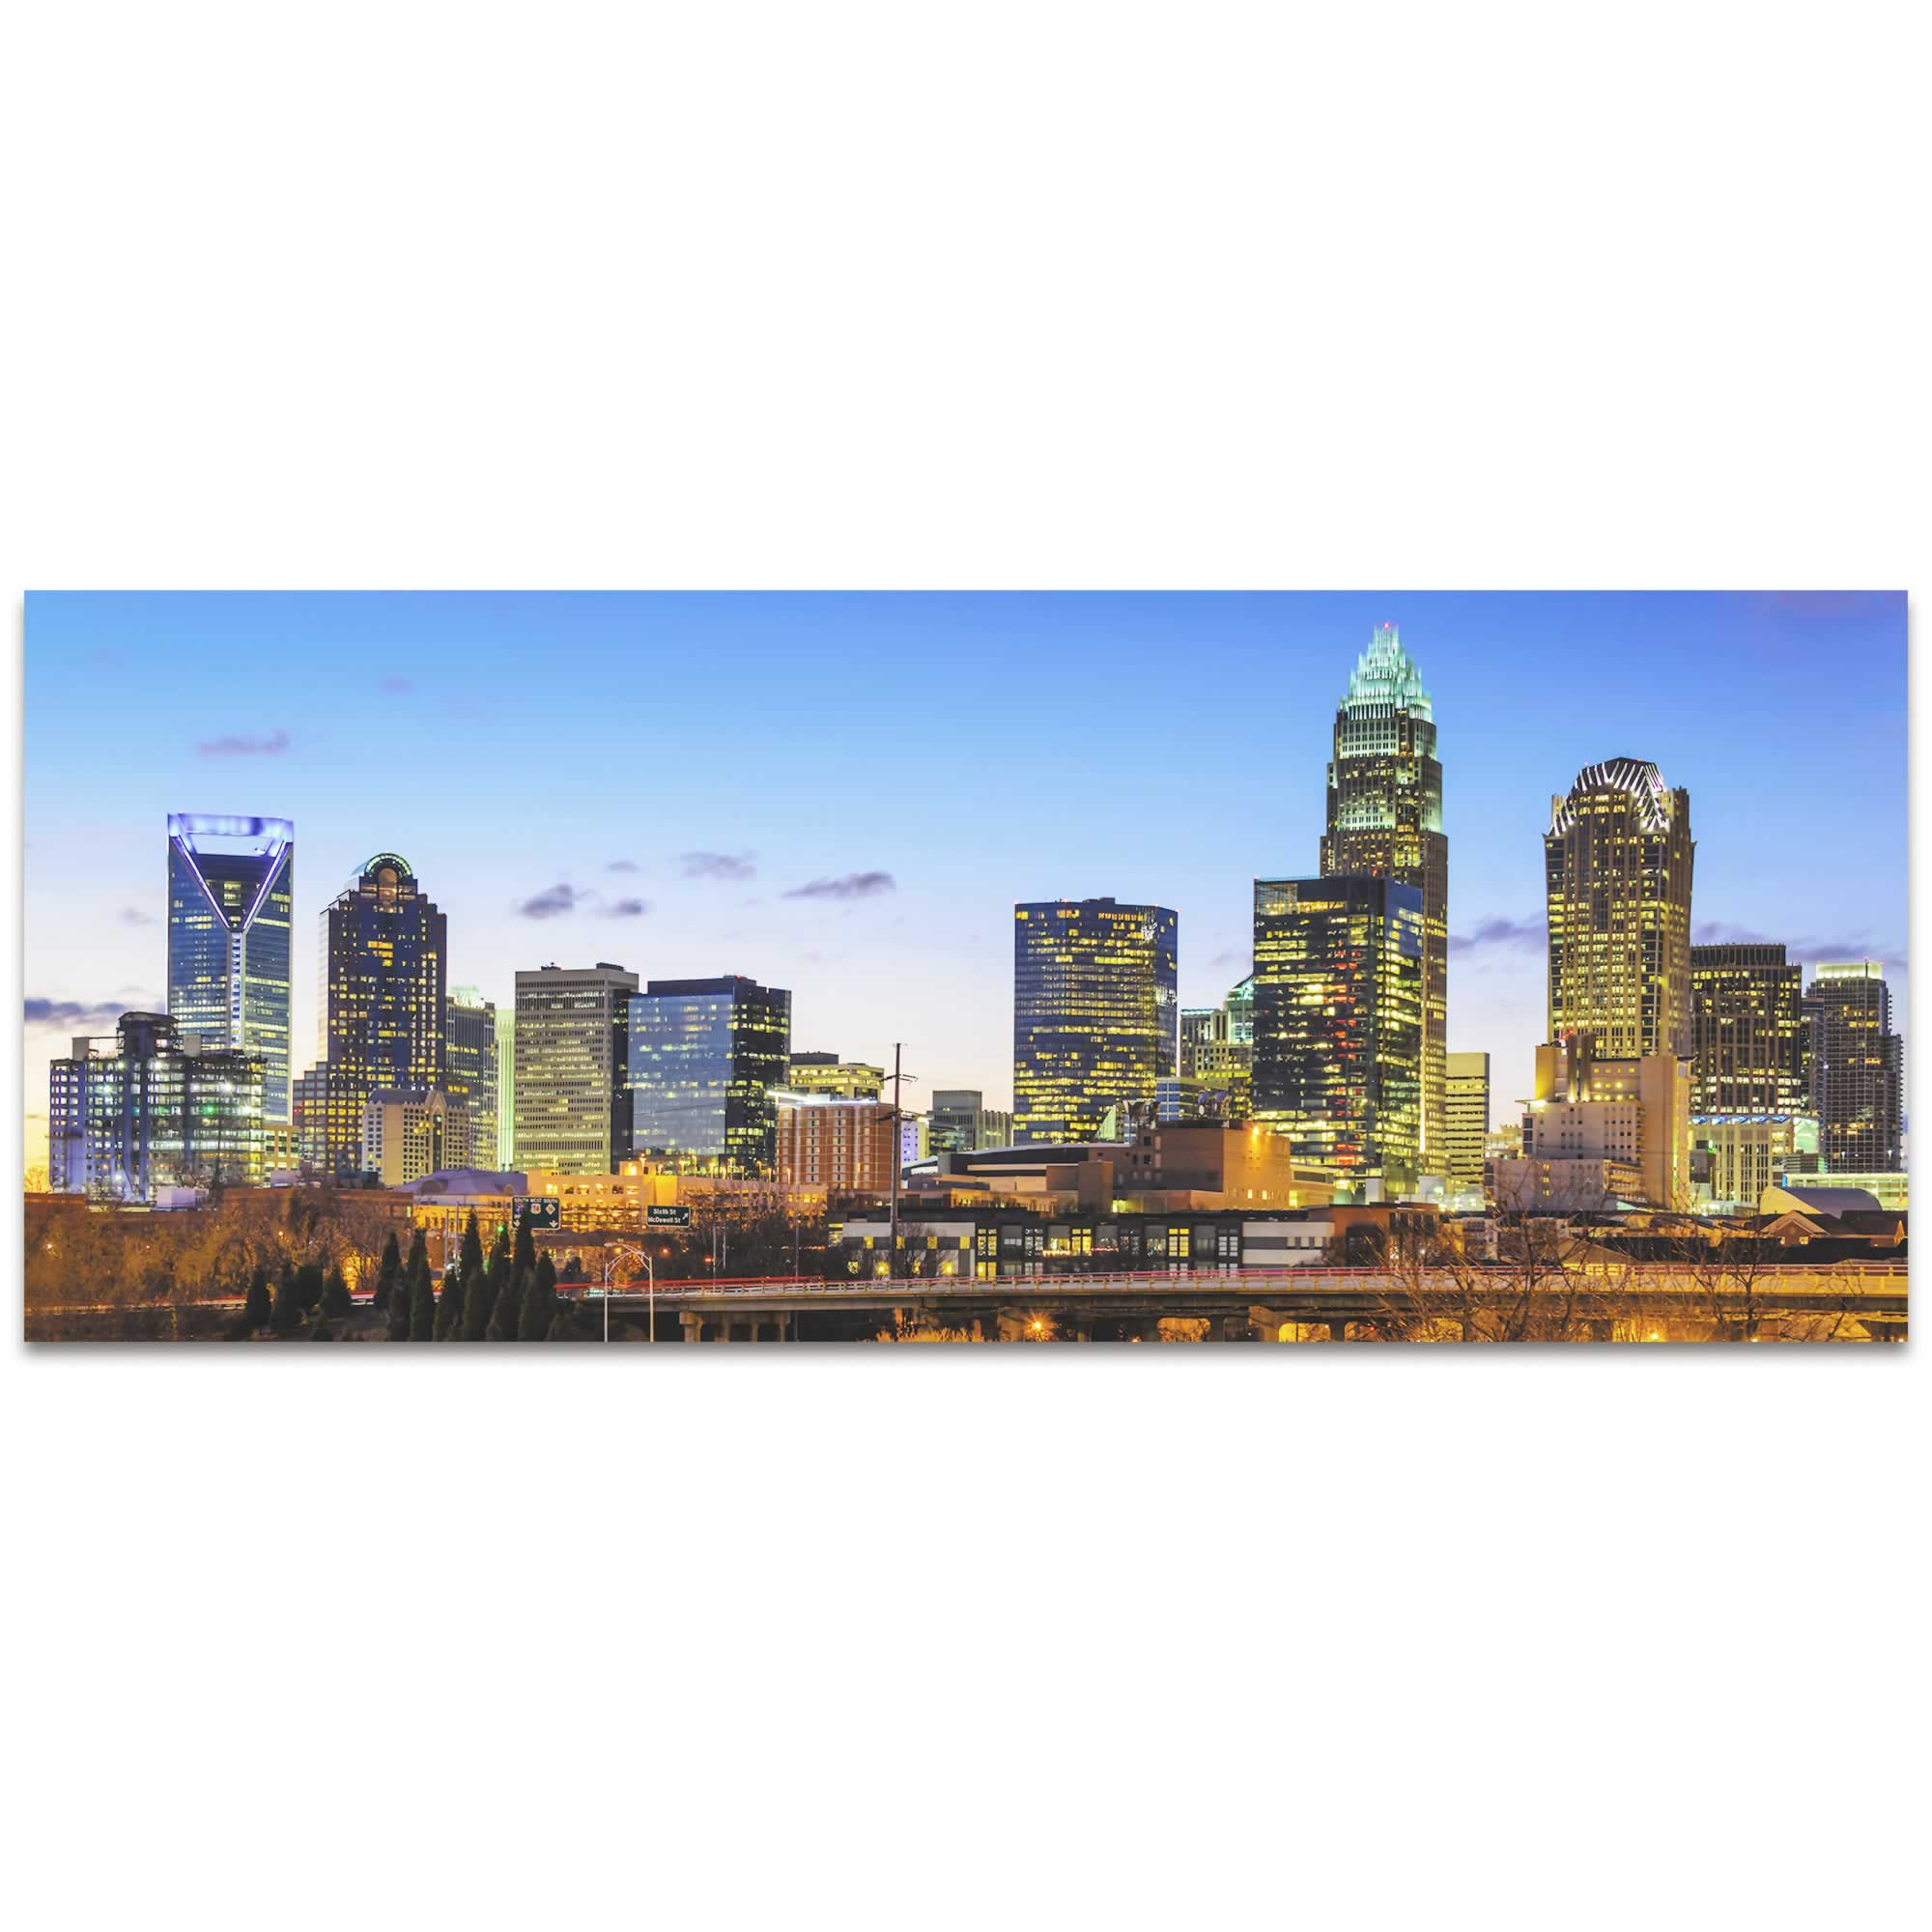 Charlotte City Skyline - Urban Modern Art, Designer Home Decor, Cityscape Wall Artwork, Trendy Contemporary Art - Alternate View 2